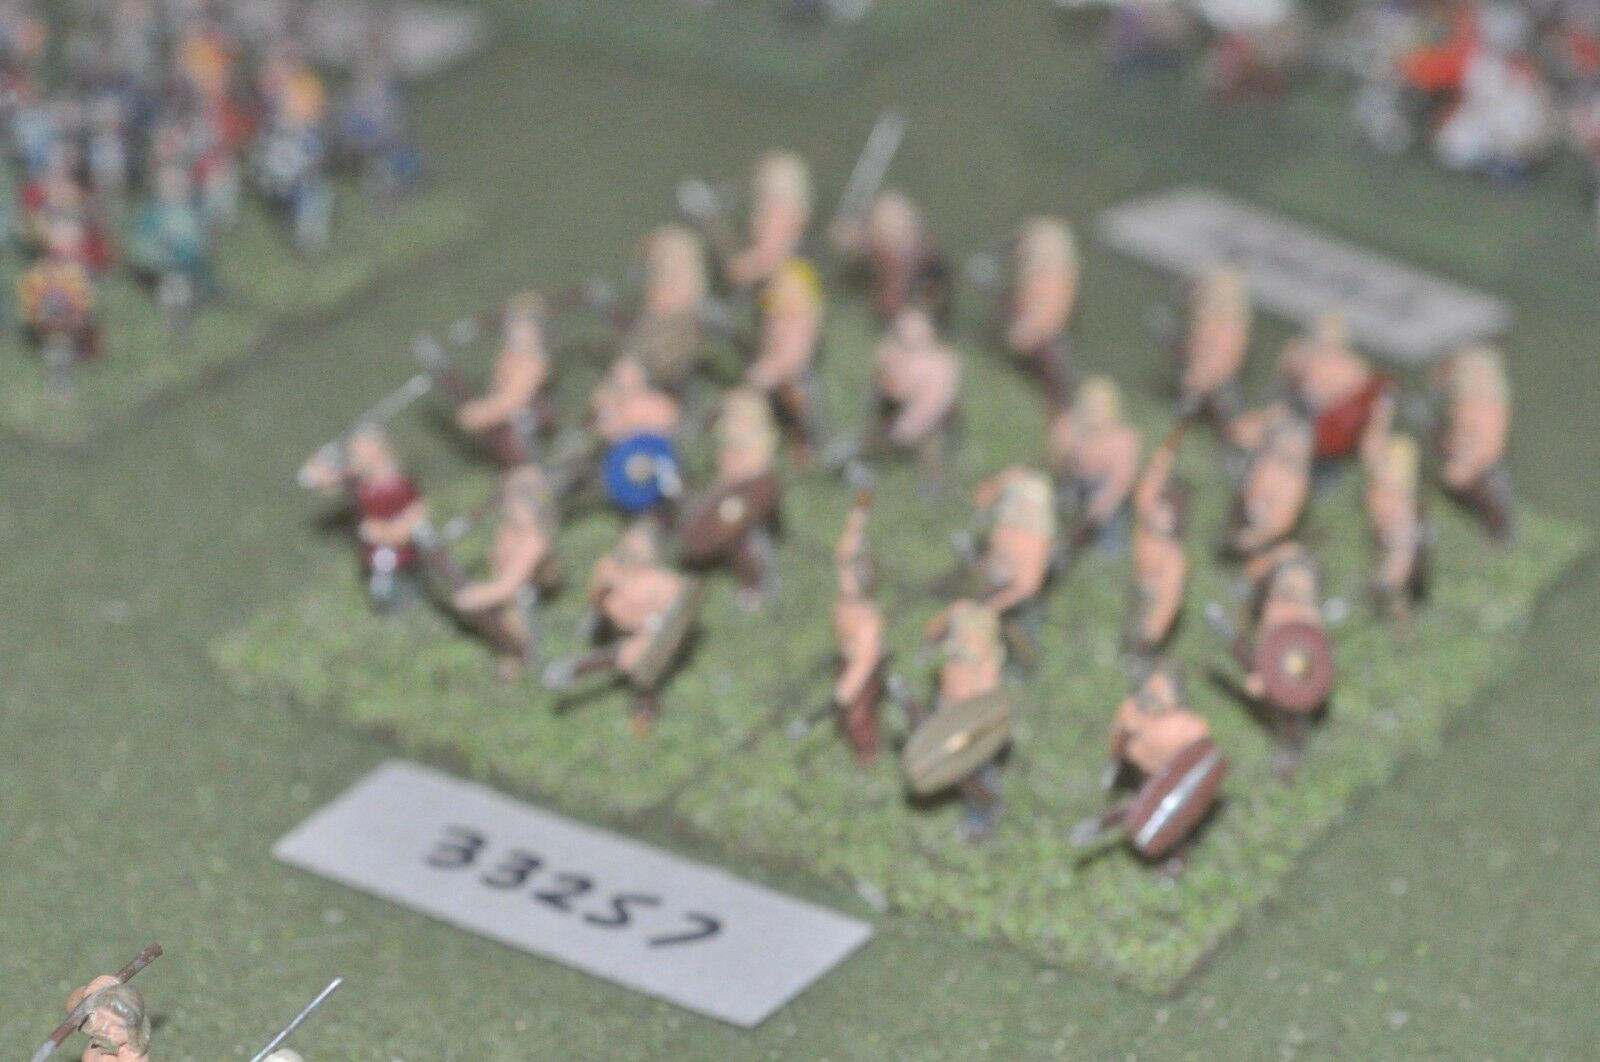 25mm época Romana galos guerreros - 24 figuras-INF (33257)